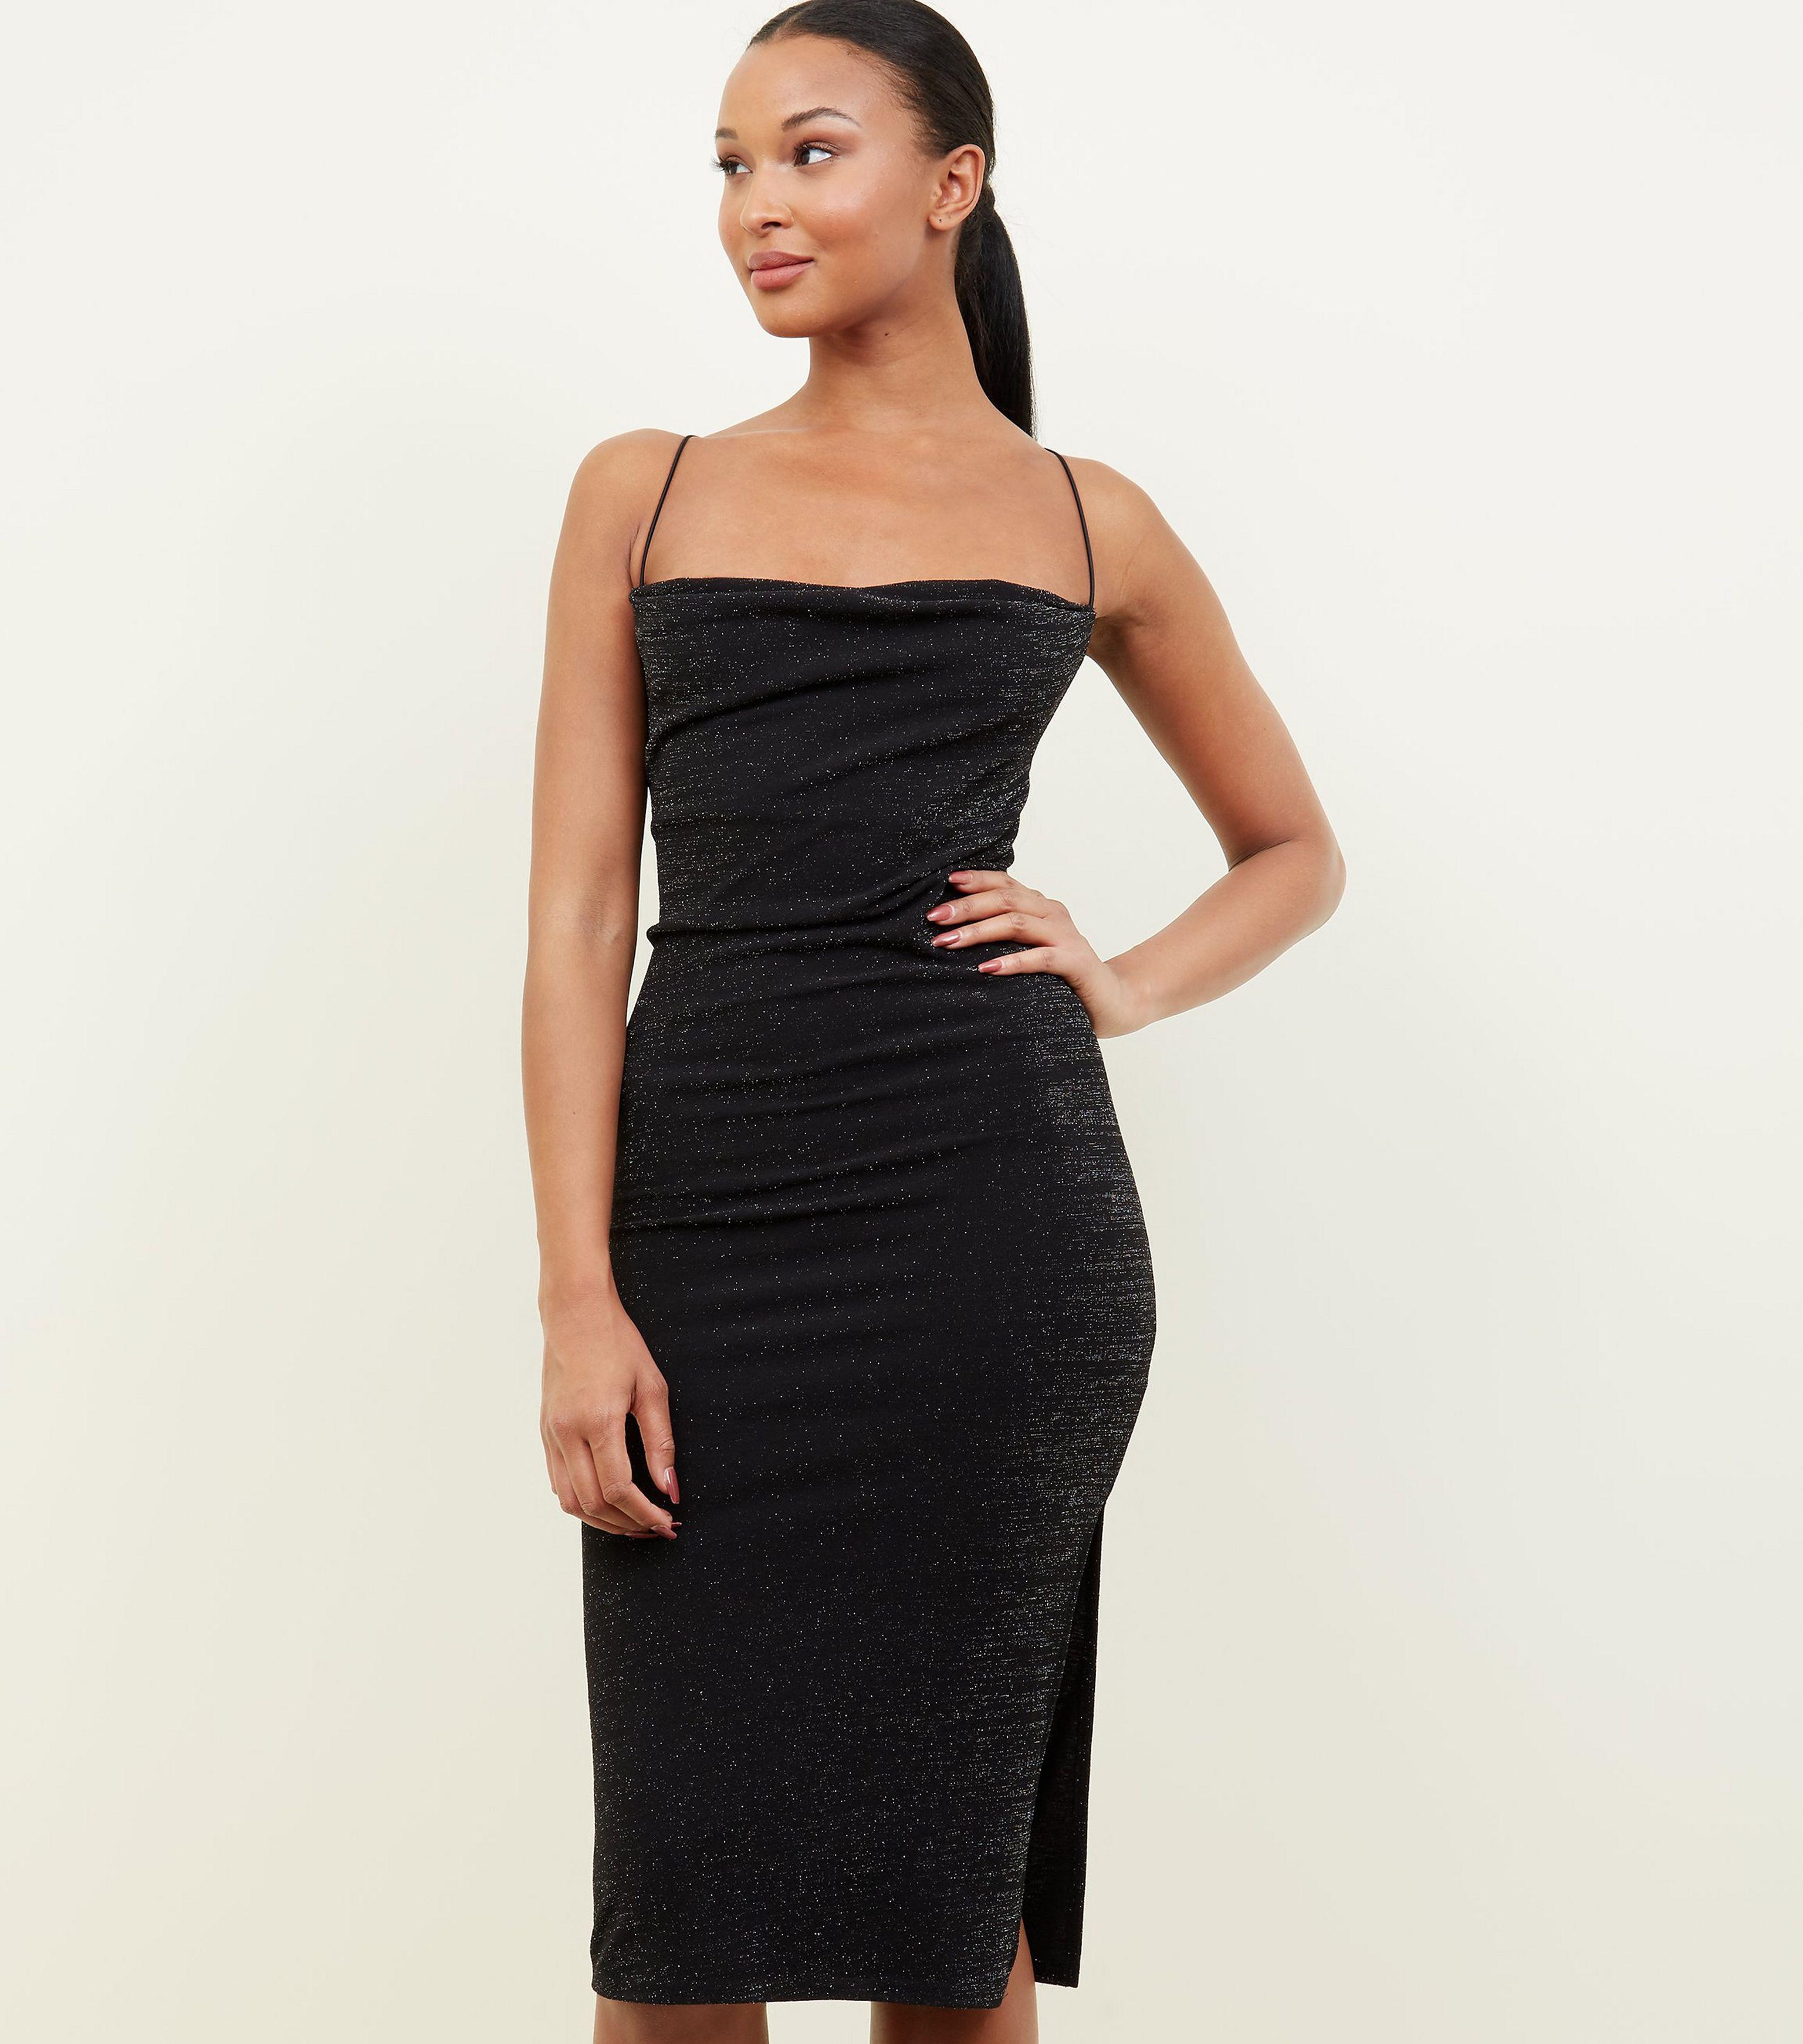 2aeee2a1cd4ab New Look Black Glitter Cowl Neck Midi Dress in Black - Lyst